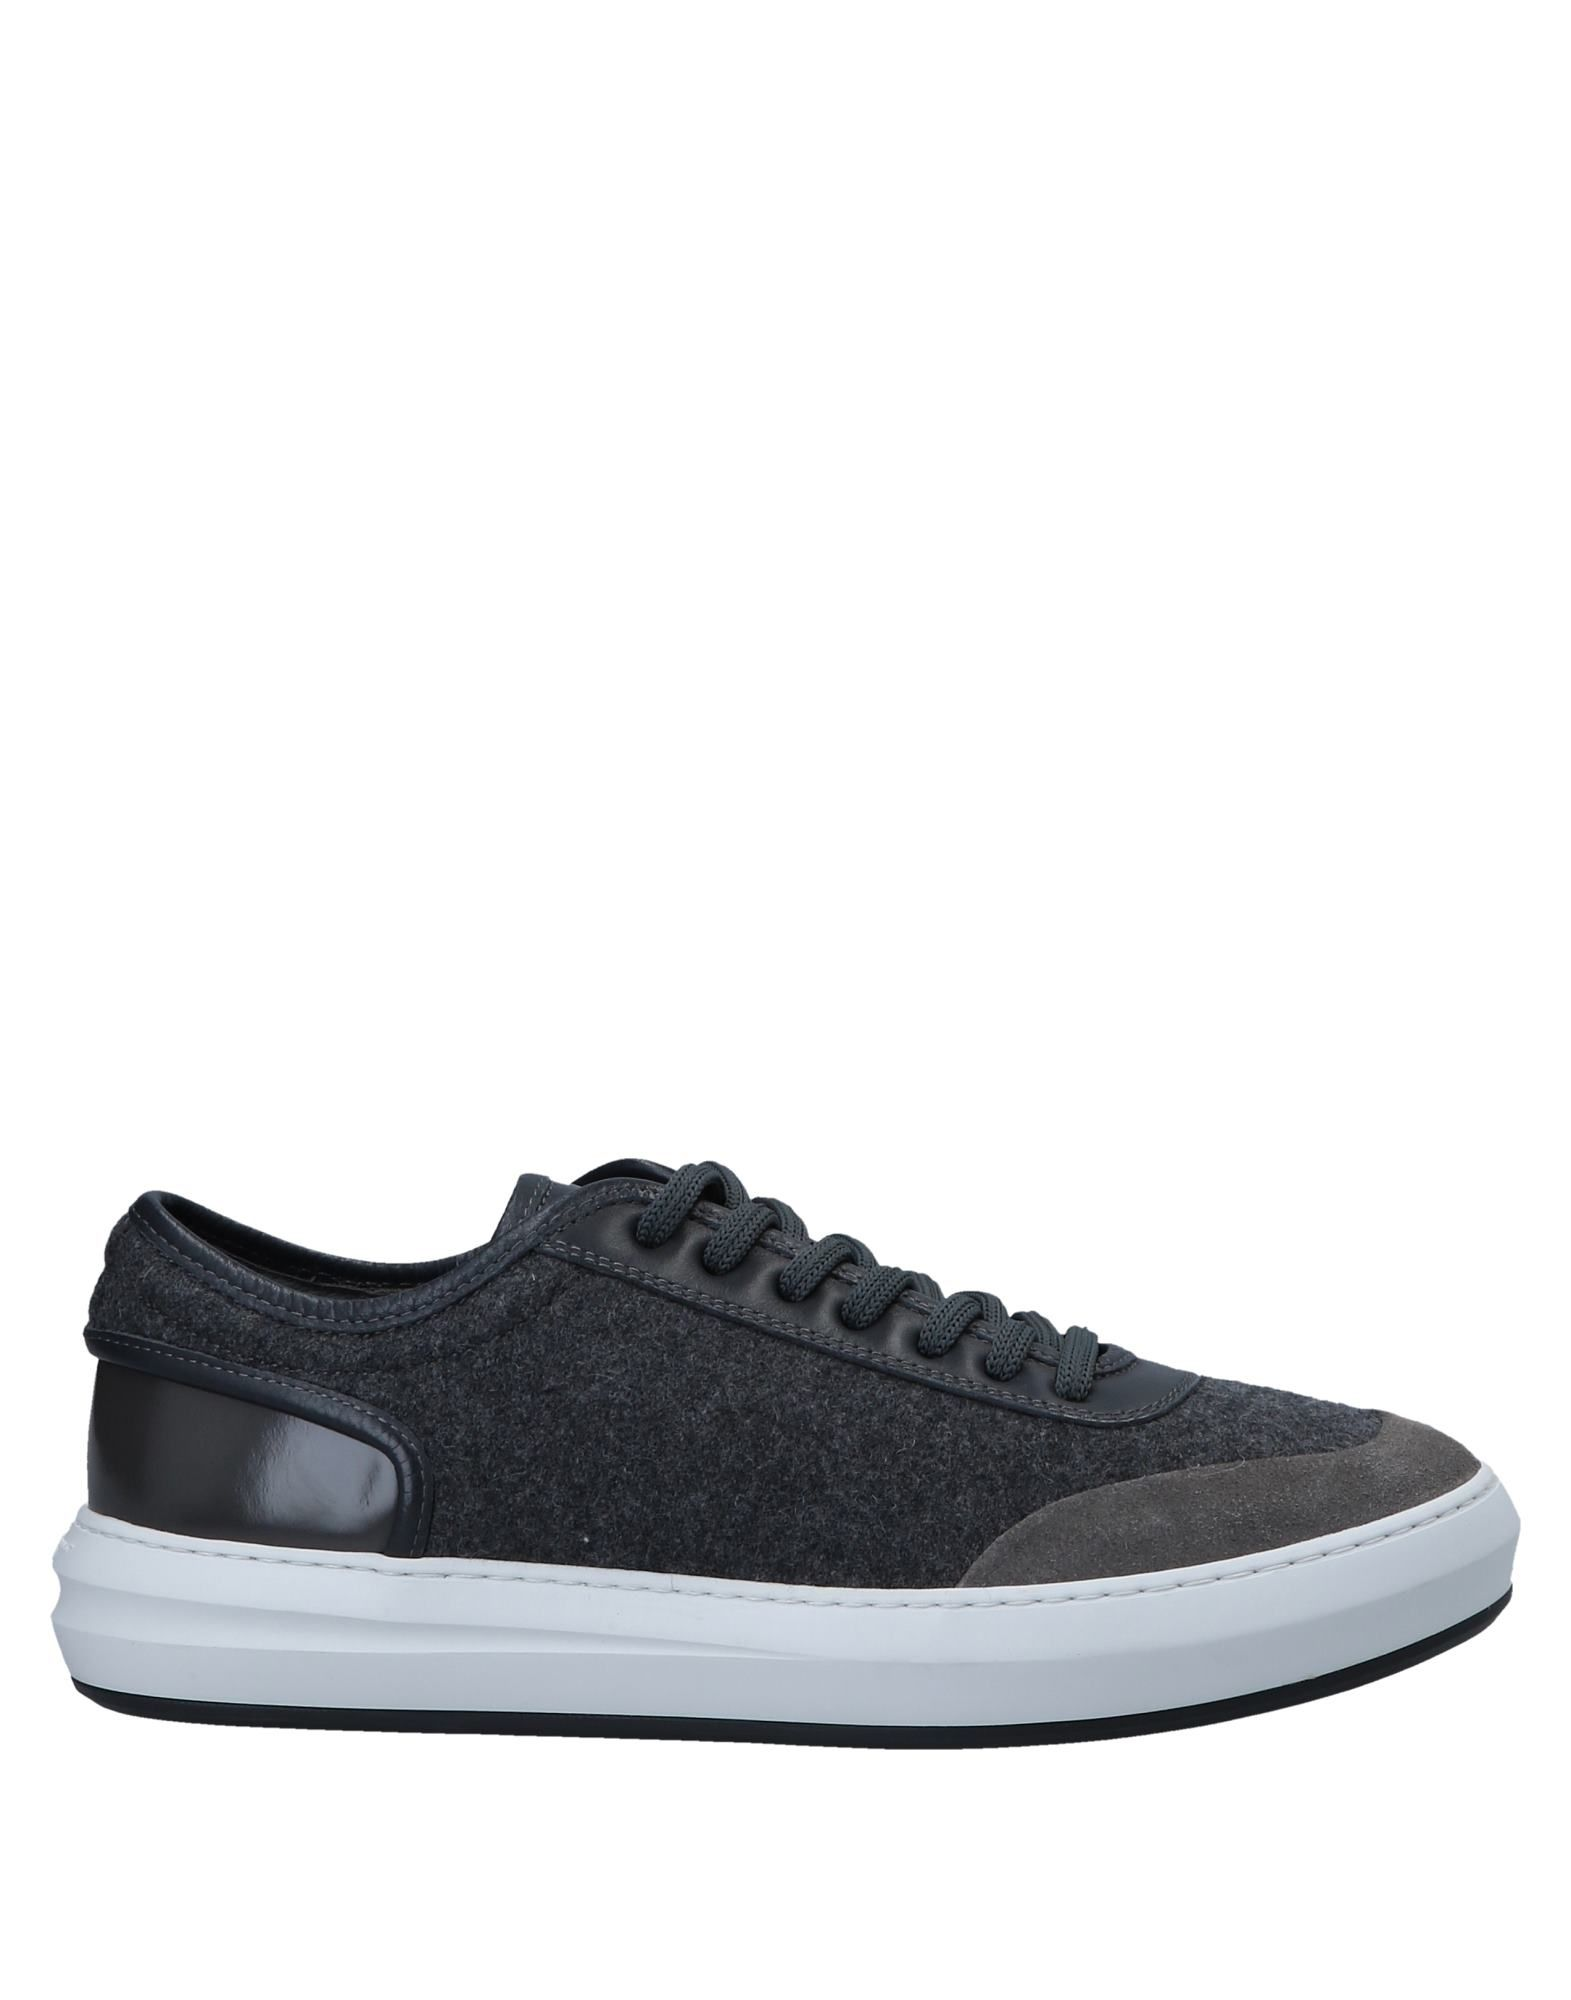 Salvatore Ferragamo Sneakers Herren  11556166OJ Gute Qualität beliebte Schuhe